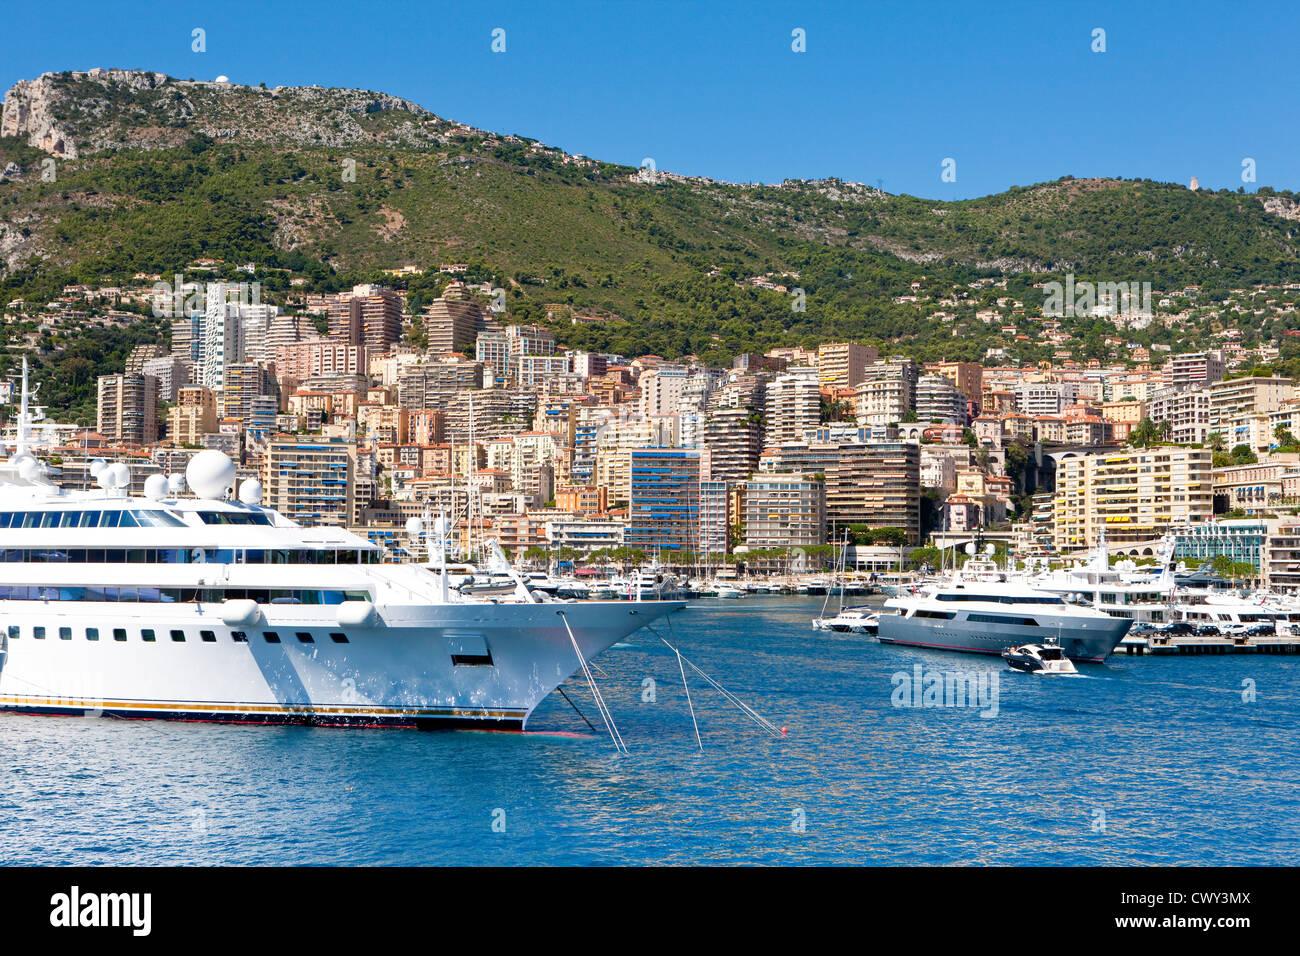 View of the Port of Hercules, La Condamine, Principality of Monaco - Stock Image